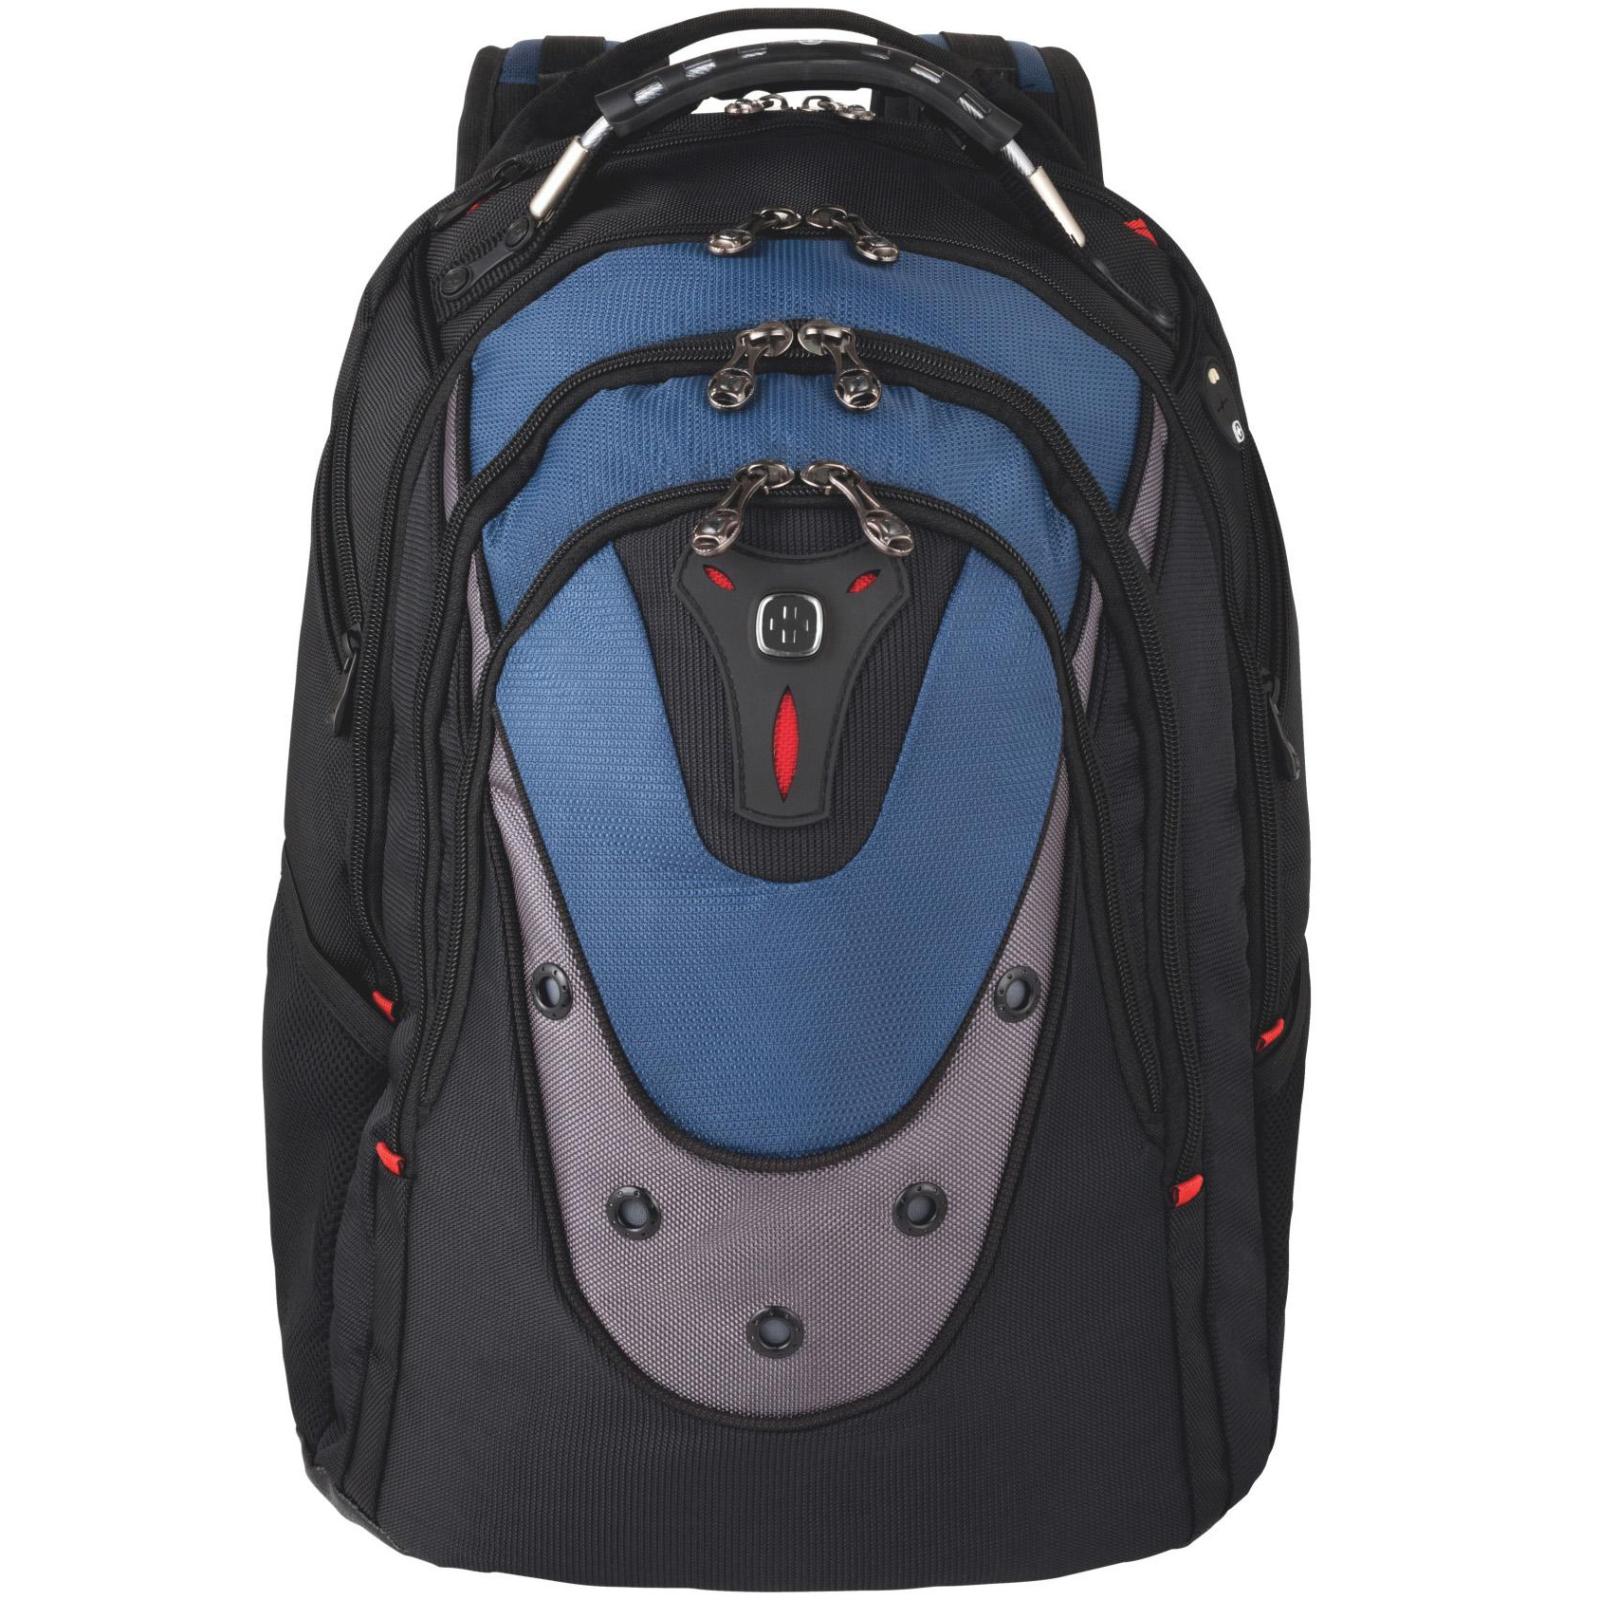 "Рюкзак для ноутбука Wenger 17"" Ibex Black/Blue (600638) изображение 2"